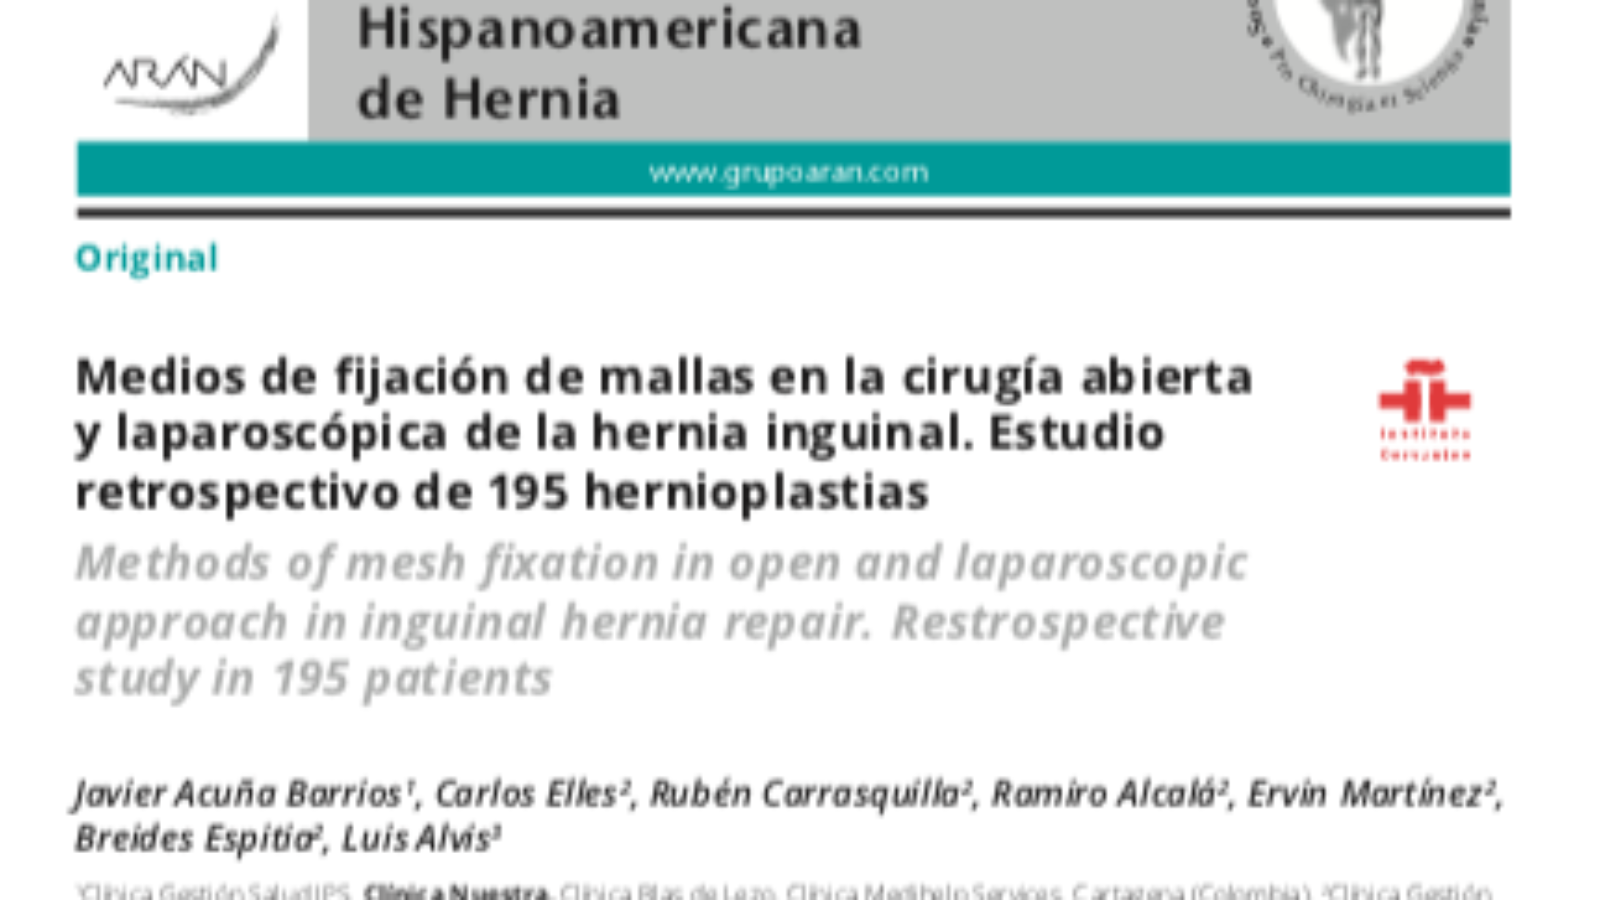 Articulo Dr Javier Acuña - Revista Hispanoamericana de Hernia